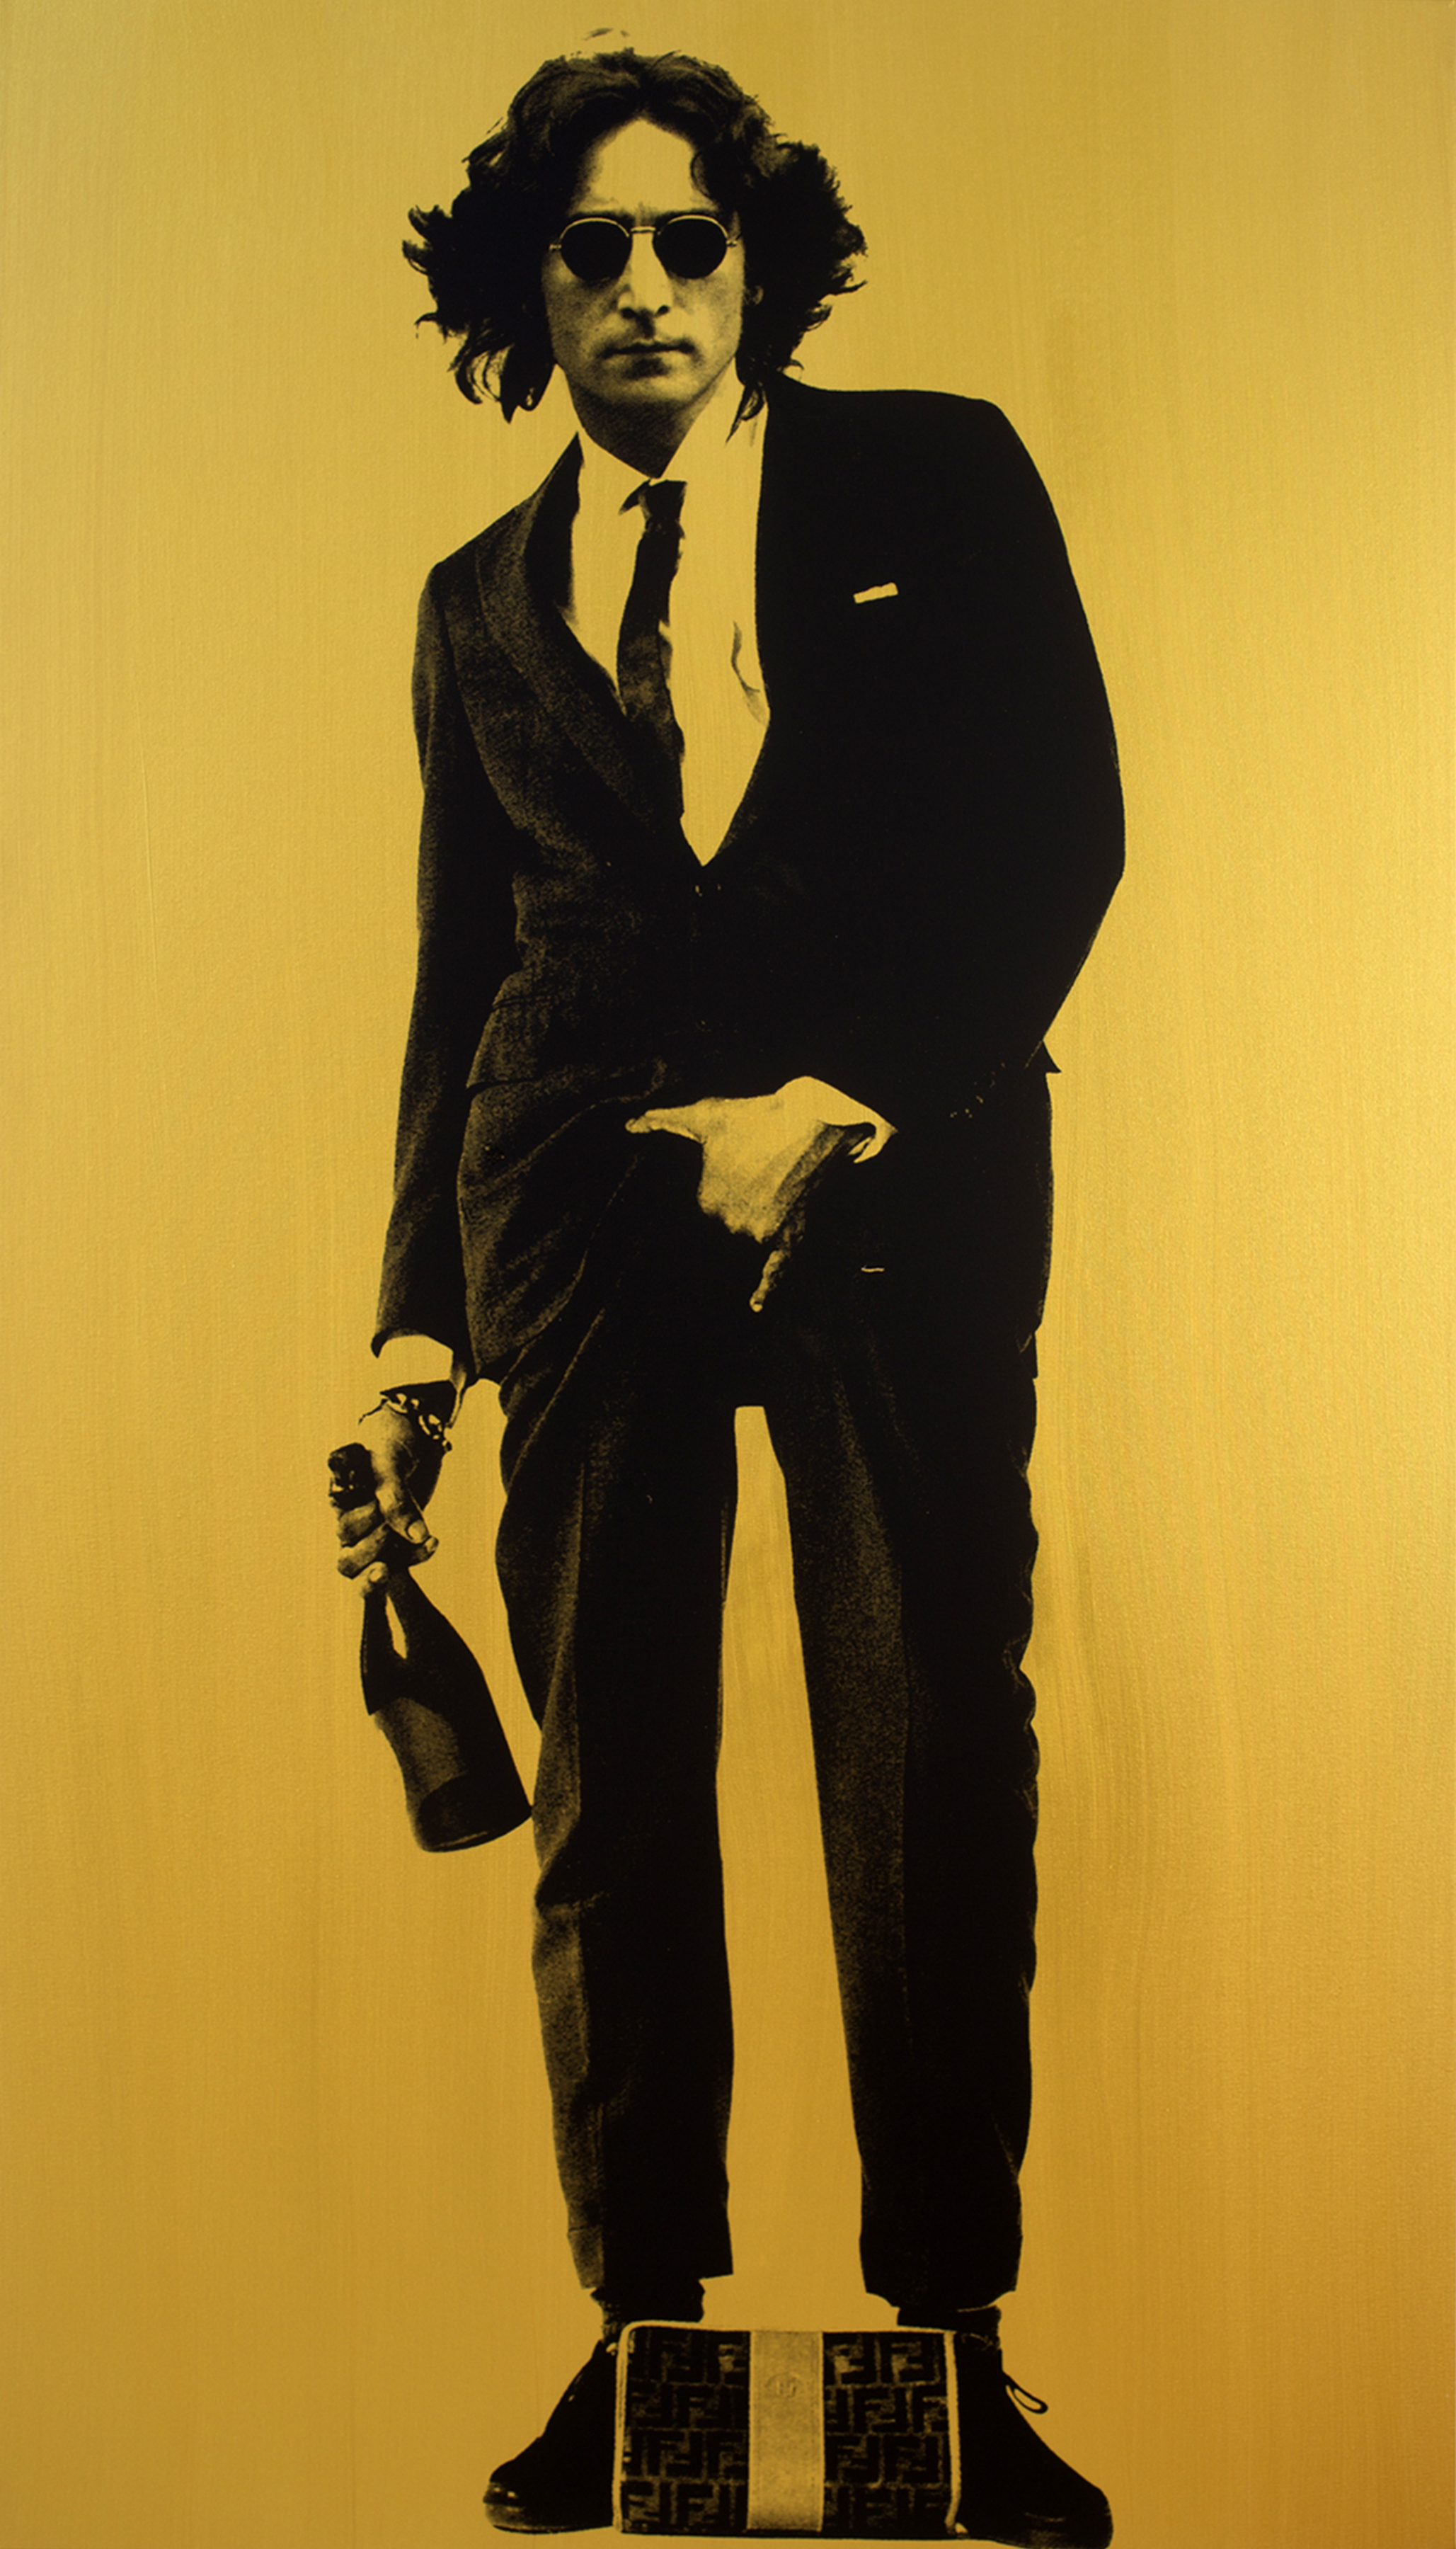 "John Lennon (Gold)_84"" x 48""_Silkscreen and Acrylic on Canvas_$15,000.00_2015.jpg"